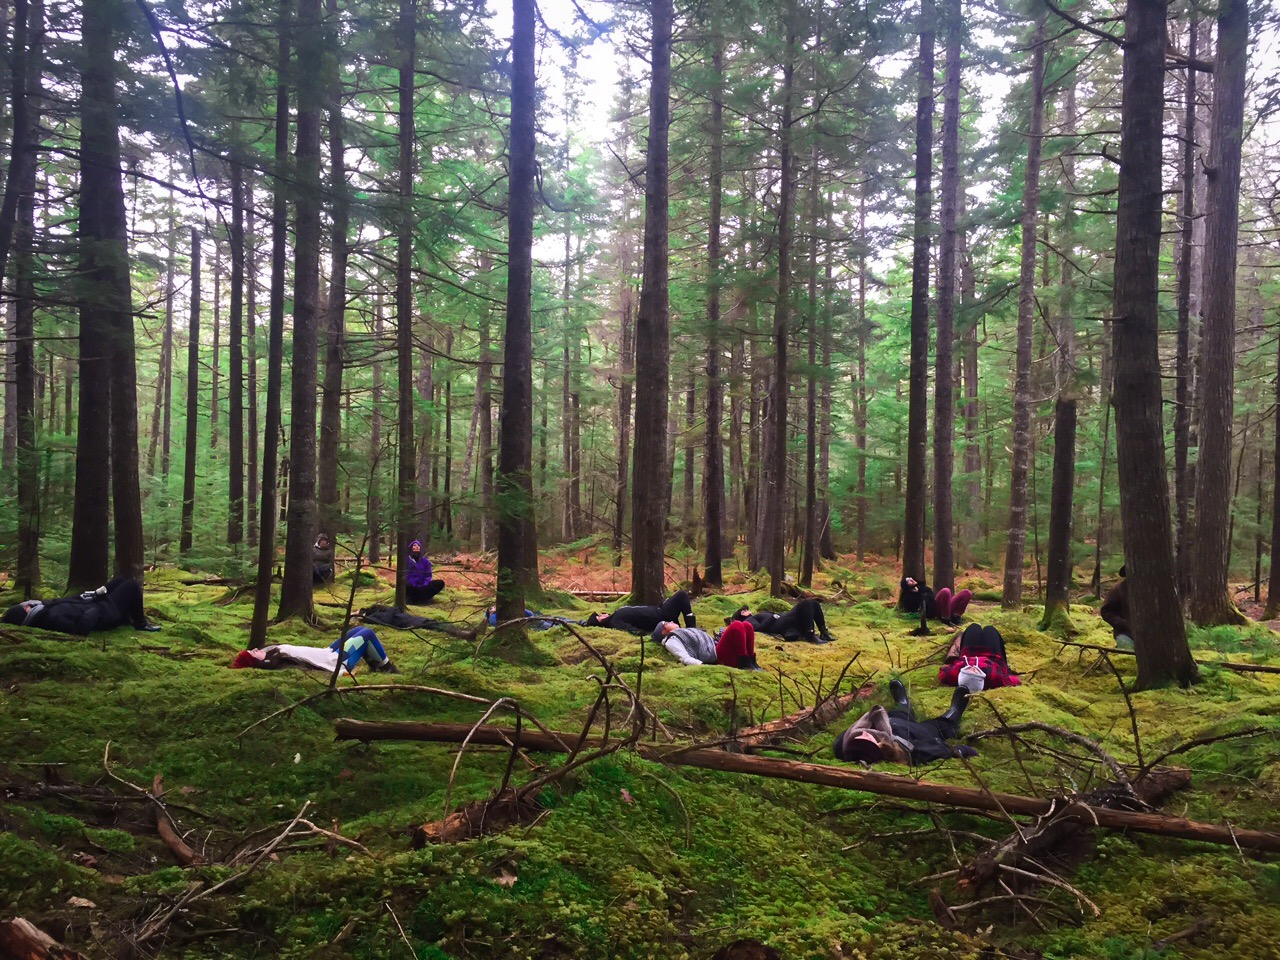 Shanti Hot Yoga 17-Day All-Inclusive Yoga Teacher Training JAN 20-FEB 26, 2018